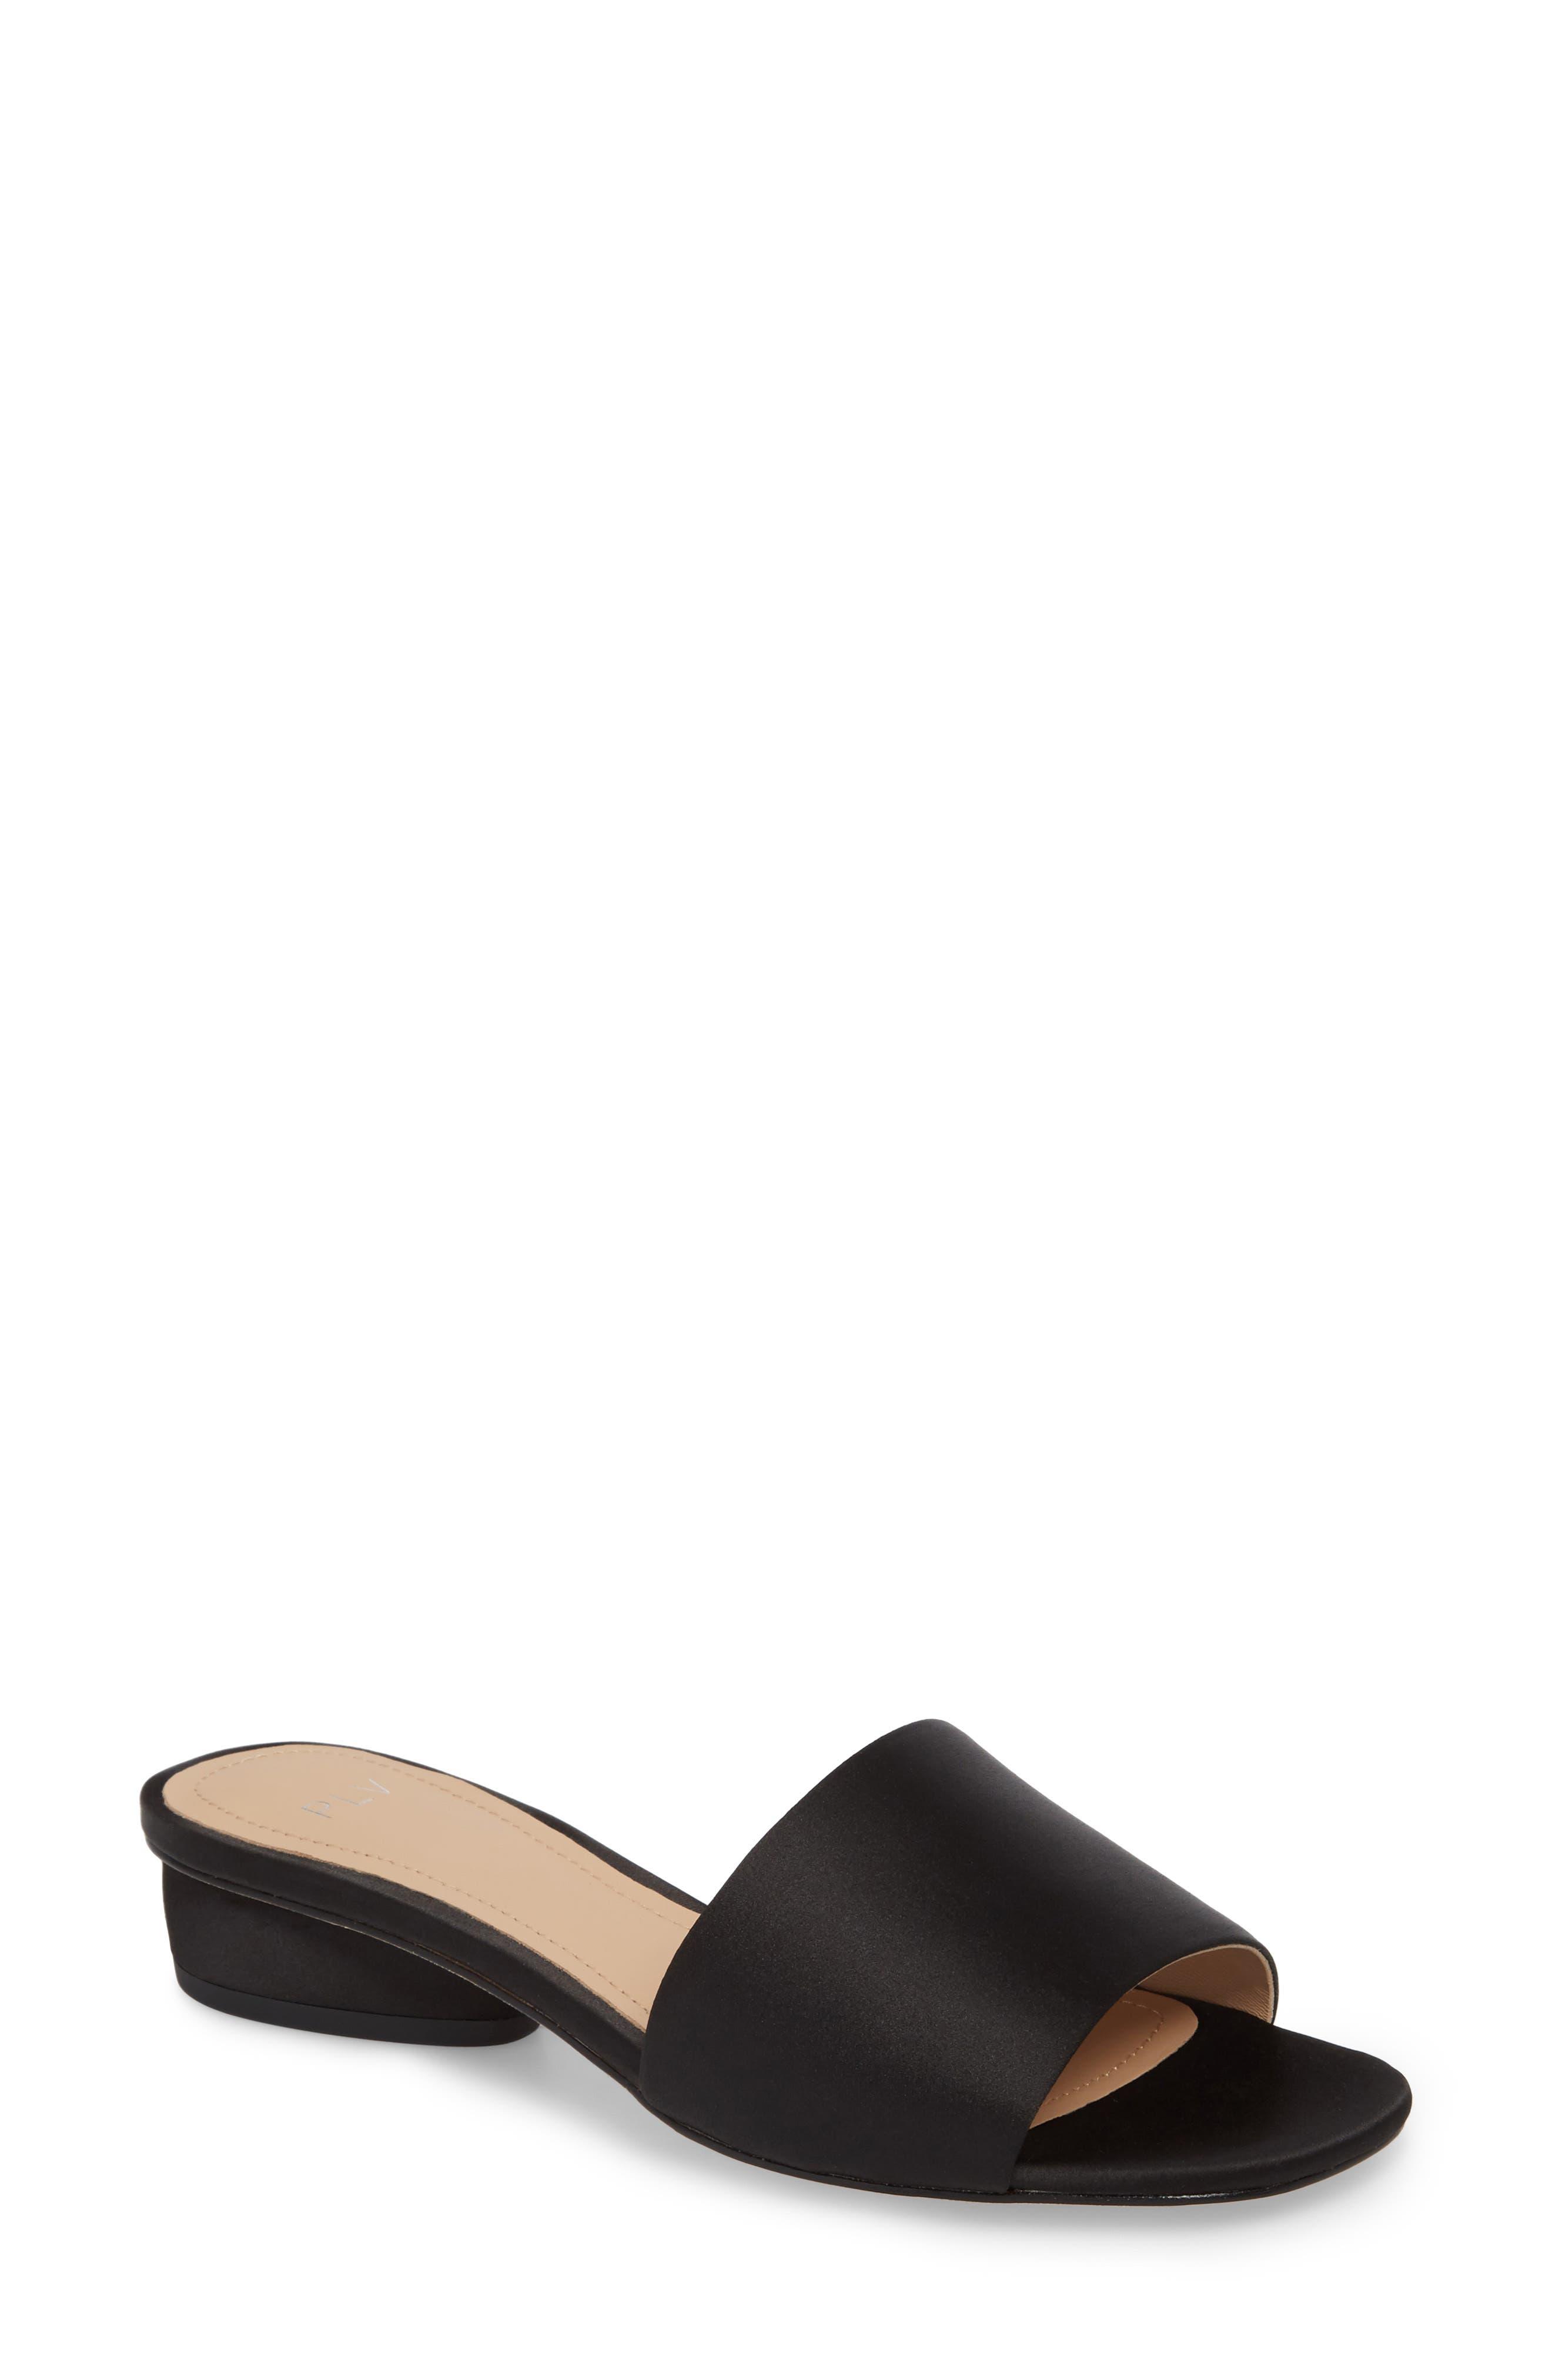 Mallory Slide Sandal,                         Main,                         color,